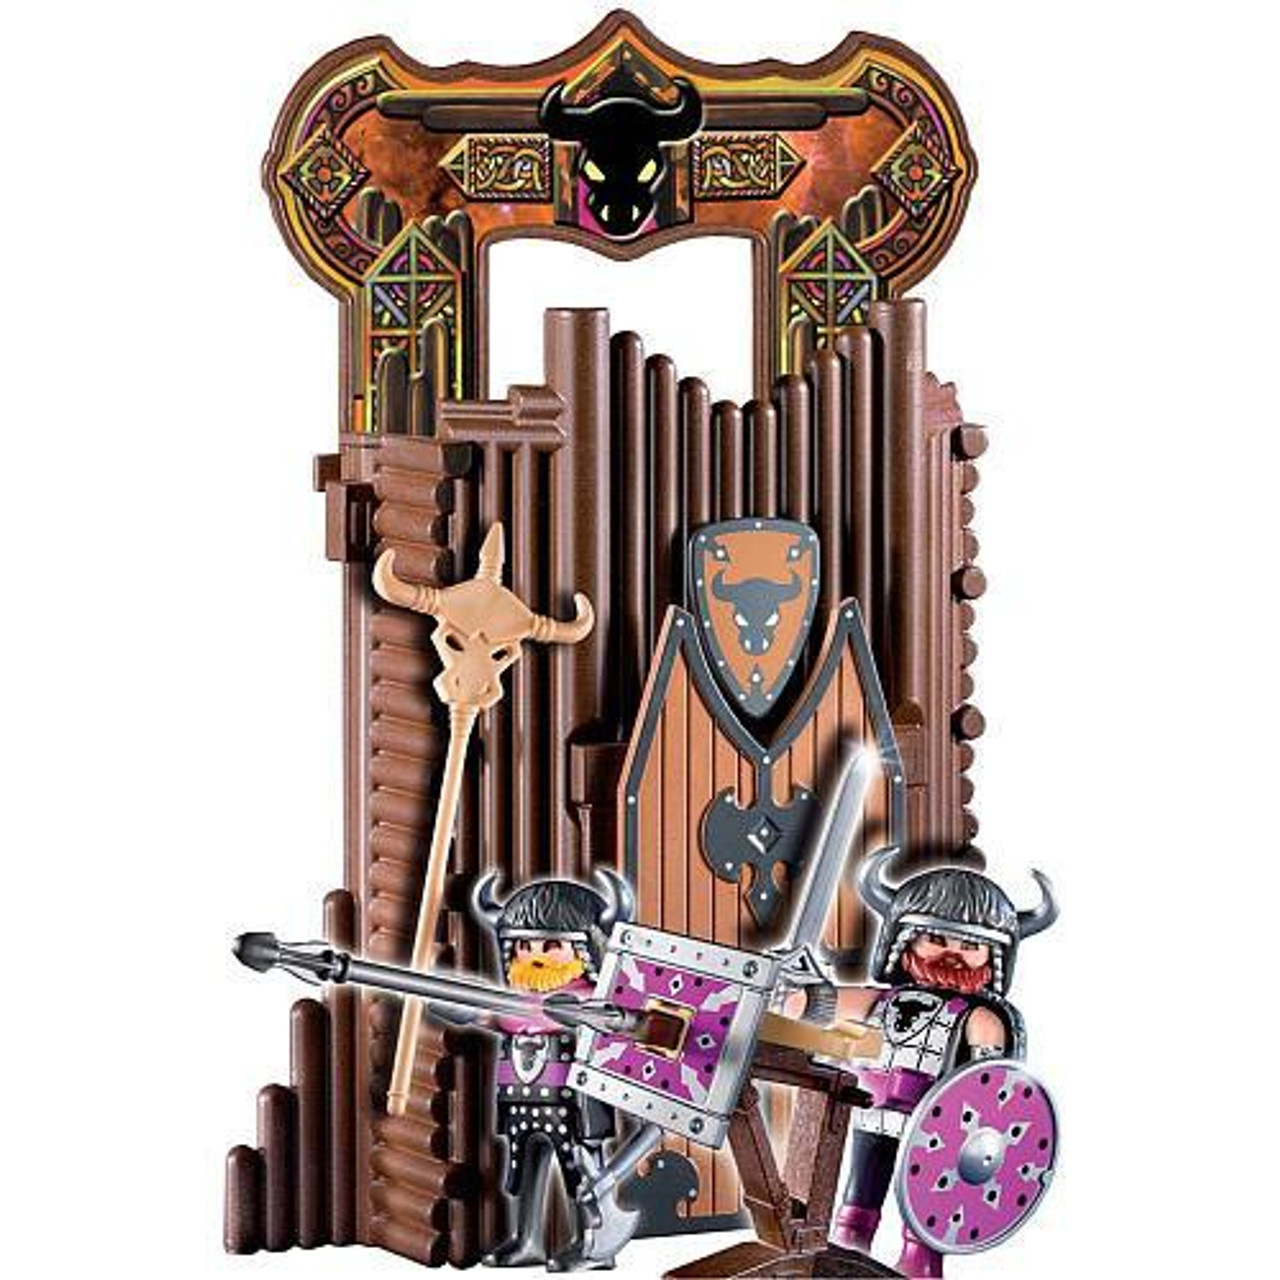 Playmobil Knights Barbarian Take Along Fort Set #4774